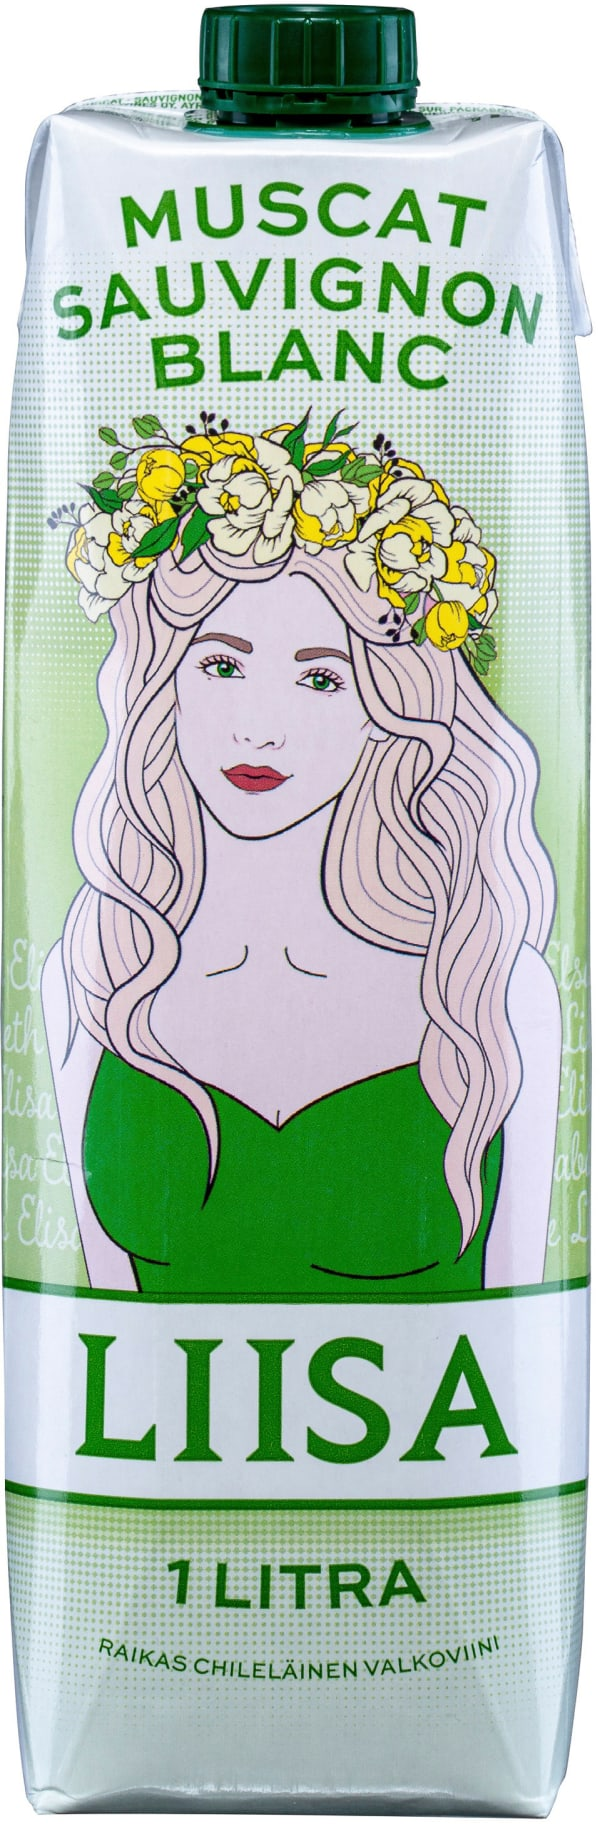 Liisa Muscat Sauvignon Blanc kartongförpackning